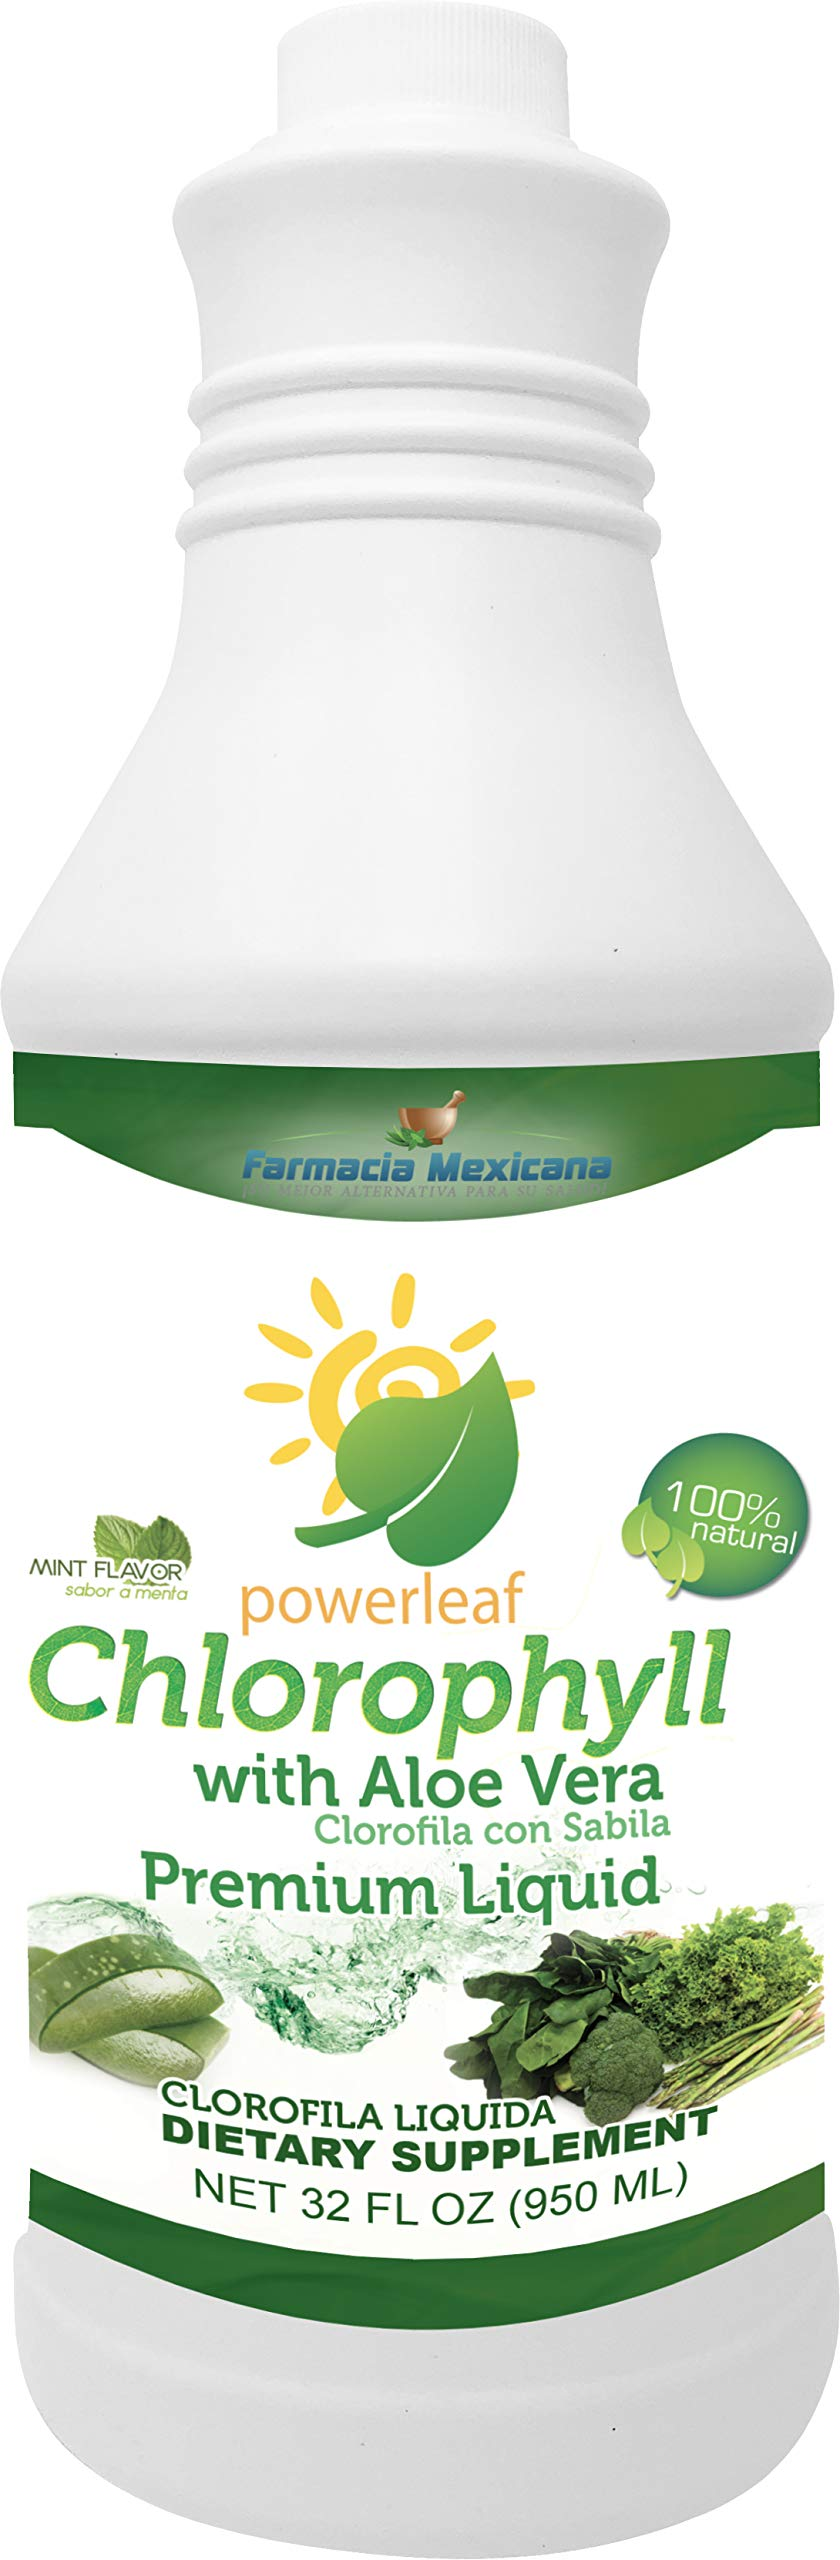 Chlorophyll Powerleaf Premium Liquid 32 oz - 100% Liquid Extract - Clorofila Liquida (with Aloe Vera & Mint)